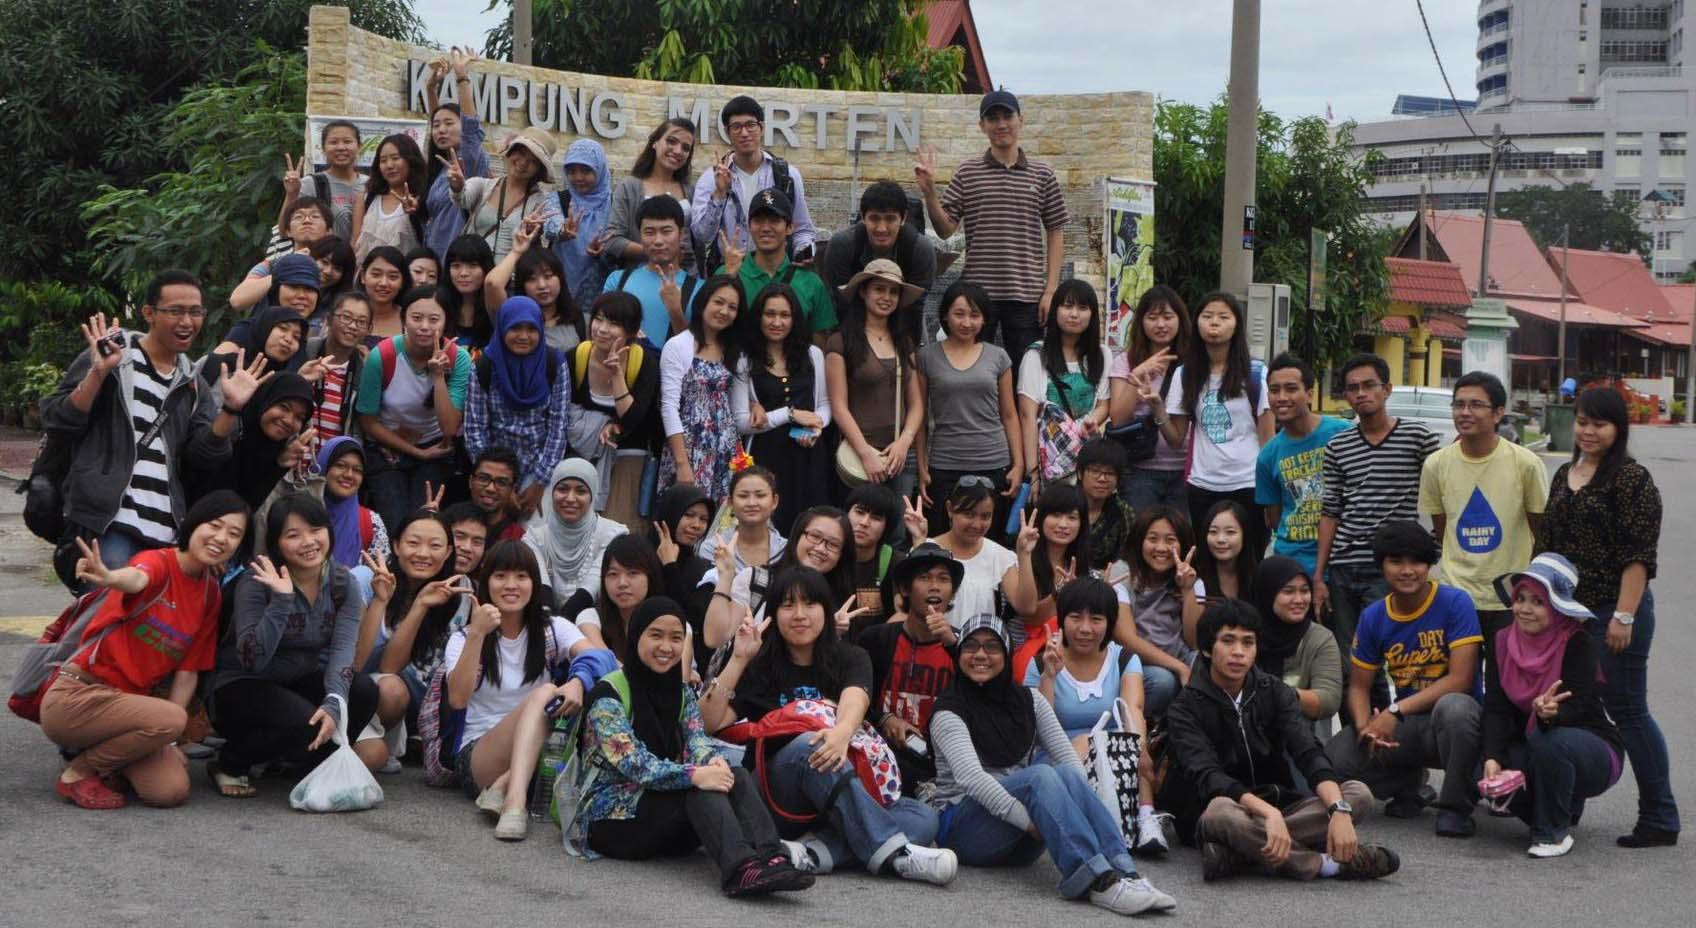 Fadheil Wiza Munabari (kiri, melambaikan tangan) bersama perwakilan dari UST lainnya, UM dan dari International student foto bersama di kampung wisata morten di Malaka Malaysia. foto istimewa